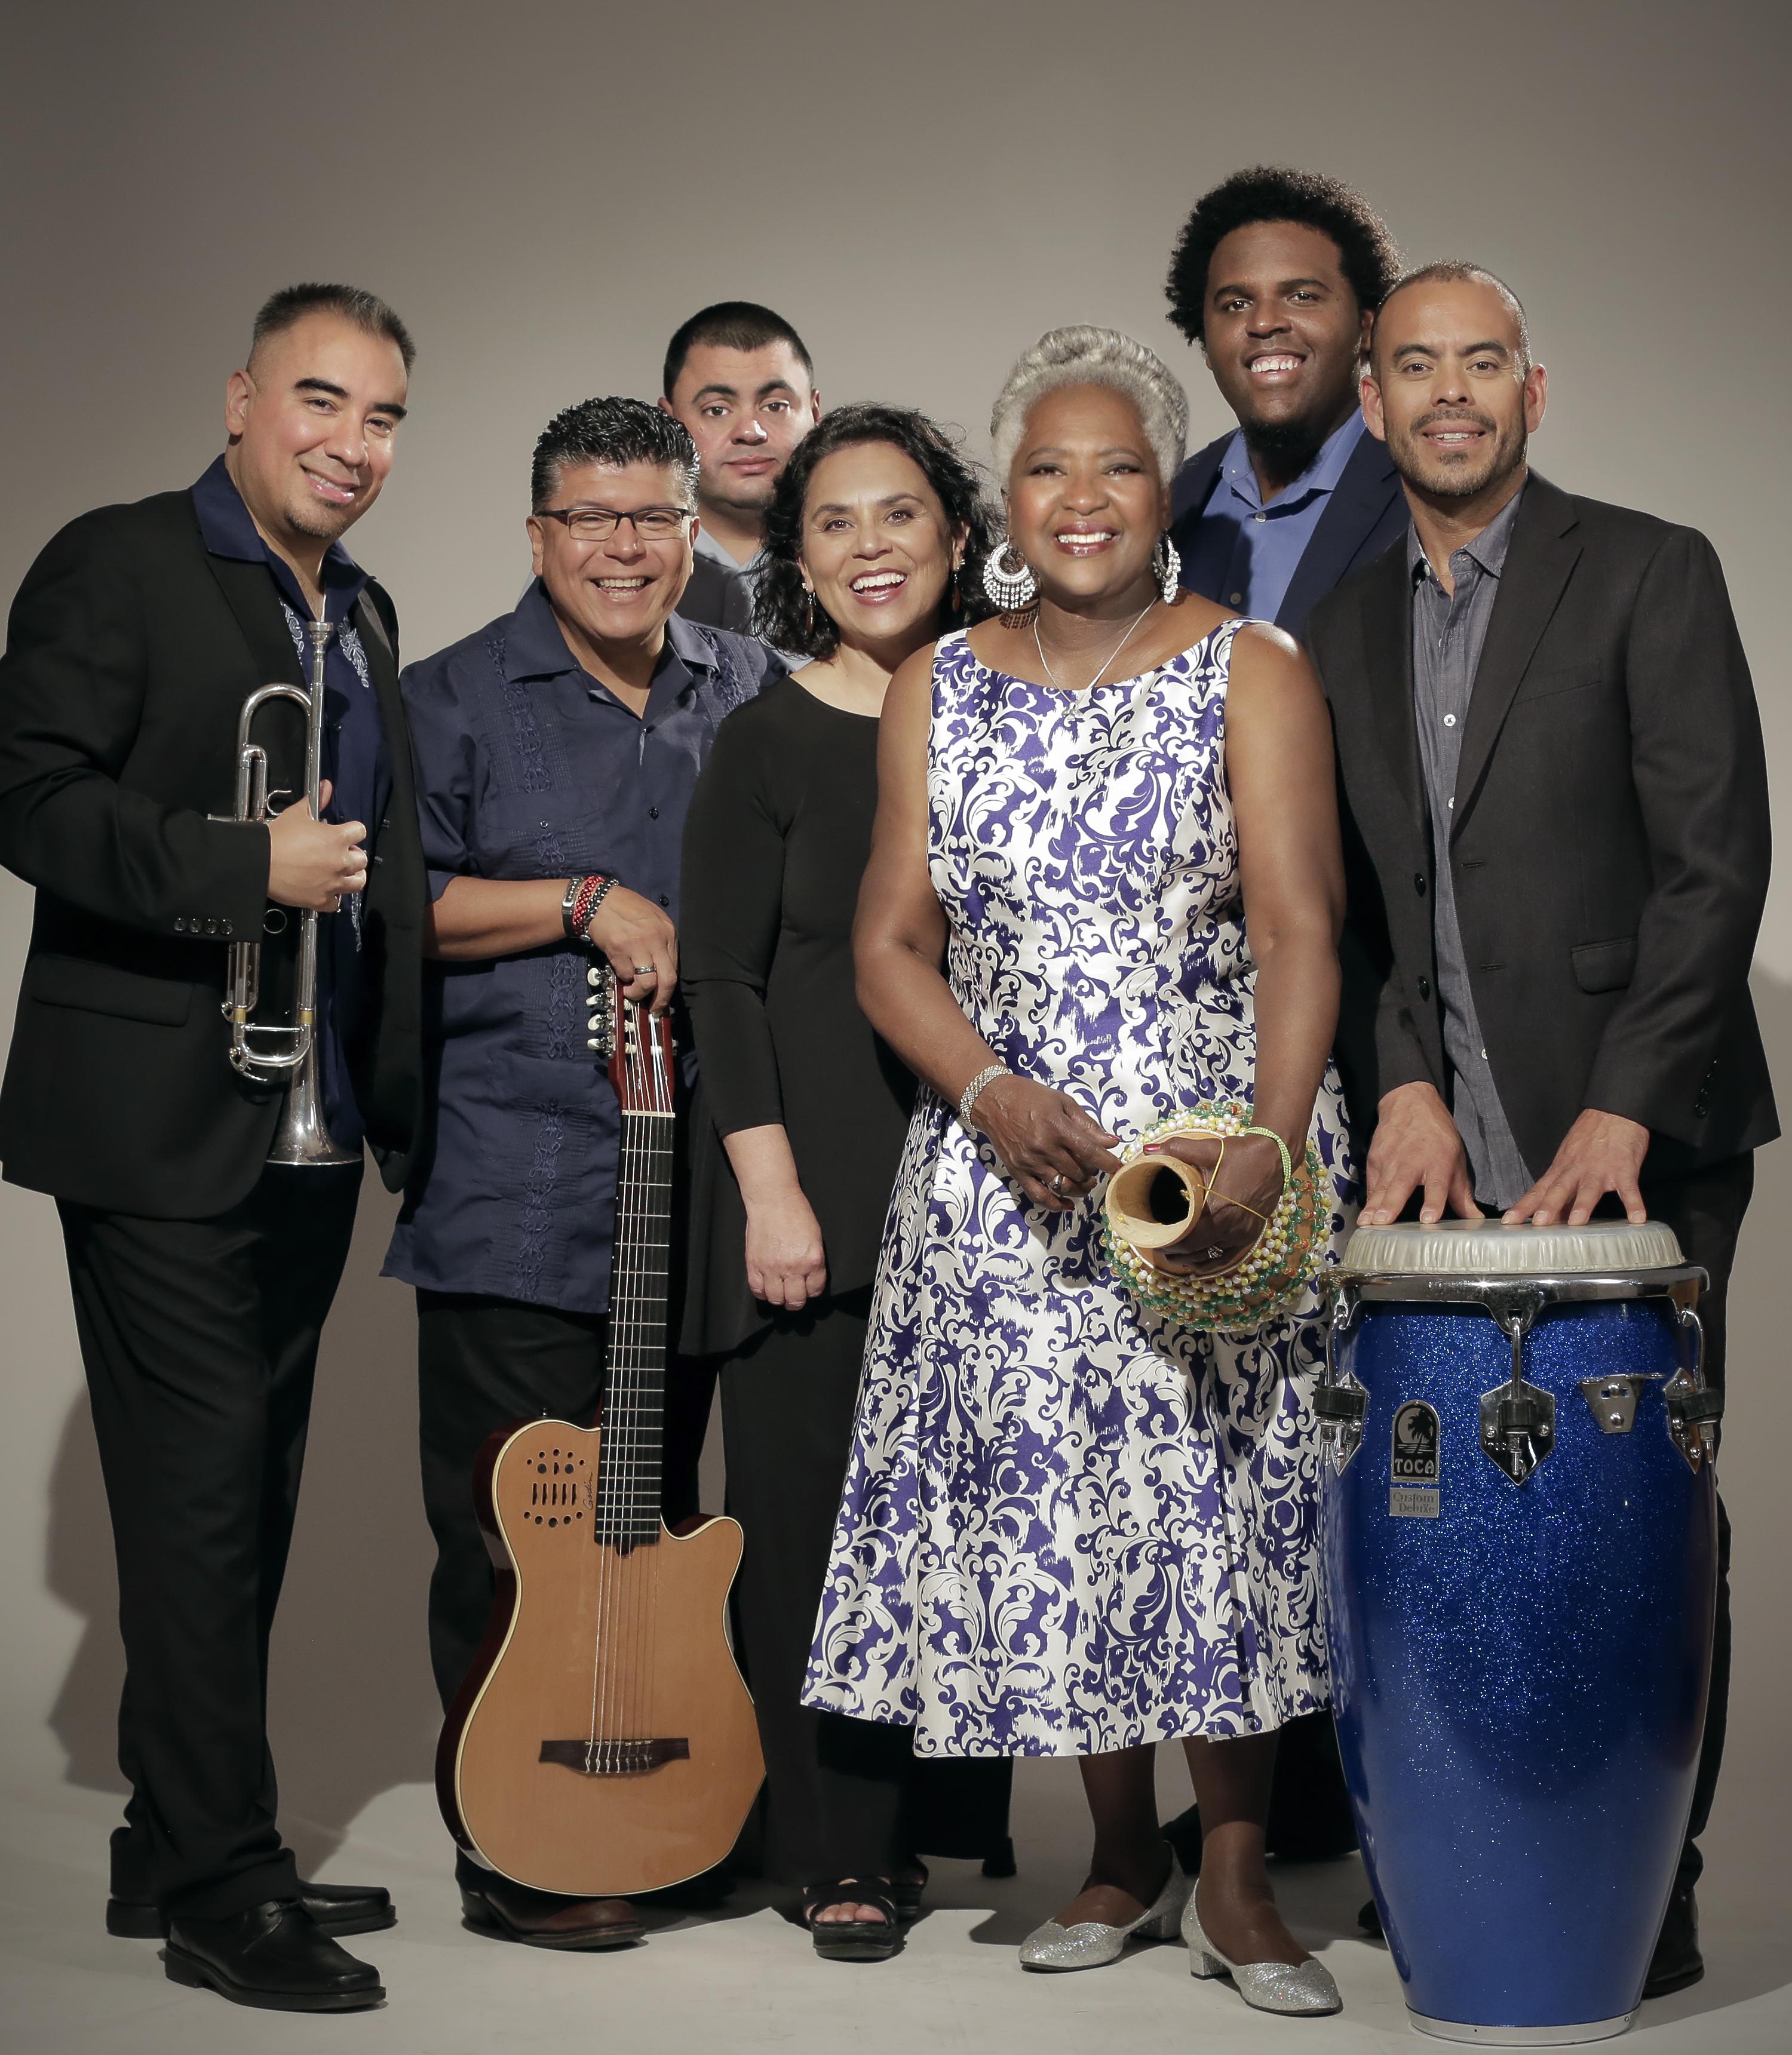 The Bobi Céspedes Band